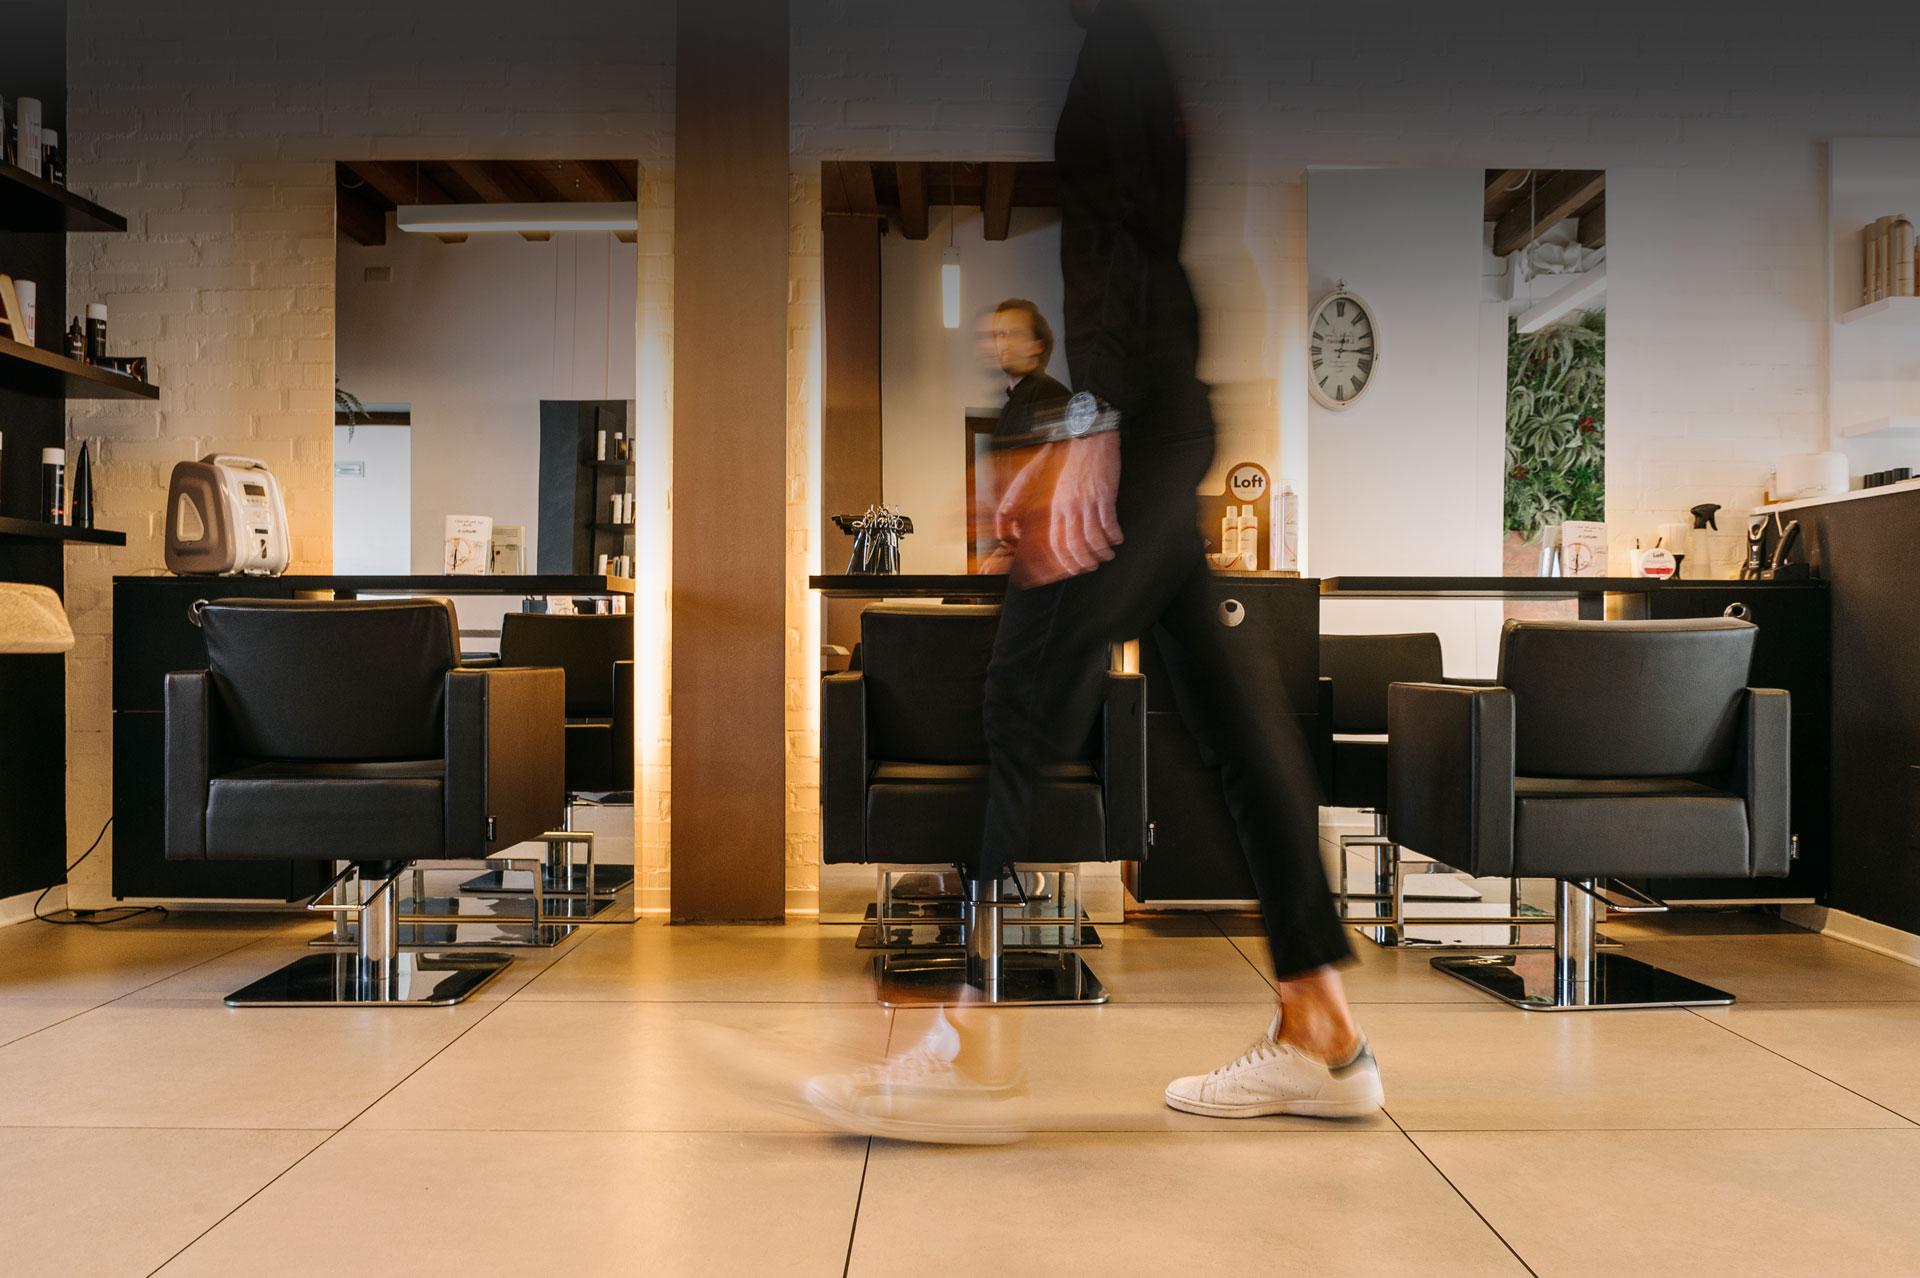 Loft Hair Studio content production by Adviroo